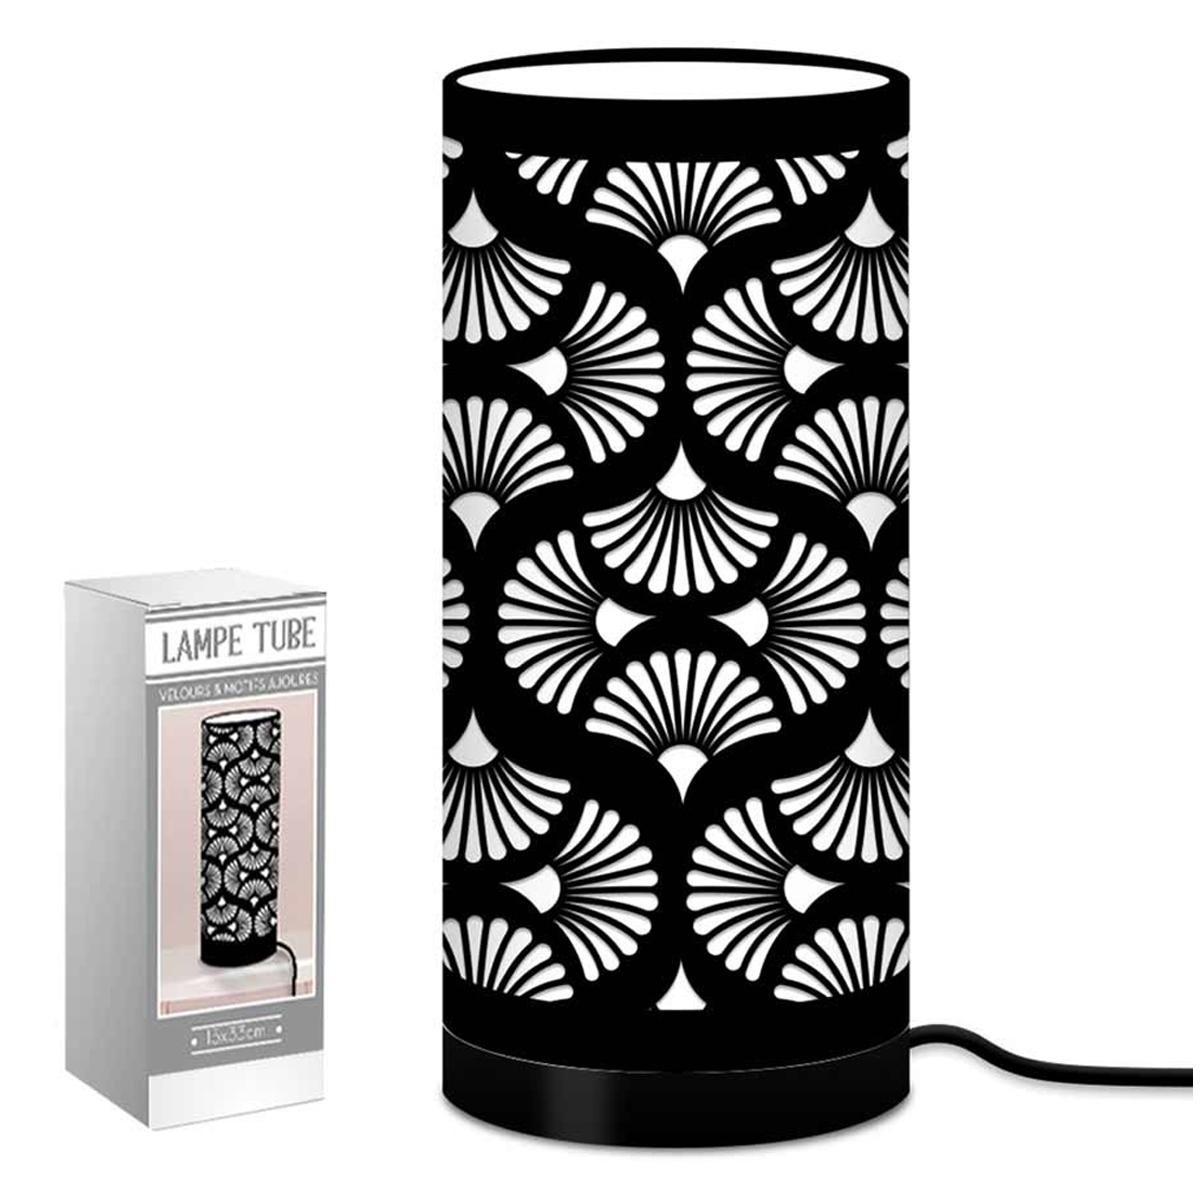 Lampe tube tissu \'Boho\' noir (ginkgo biloba) - 33x15 cm - [Q9073]